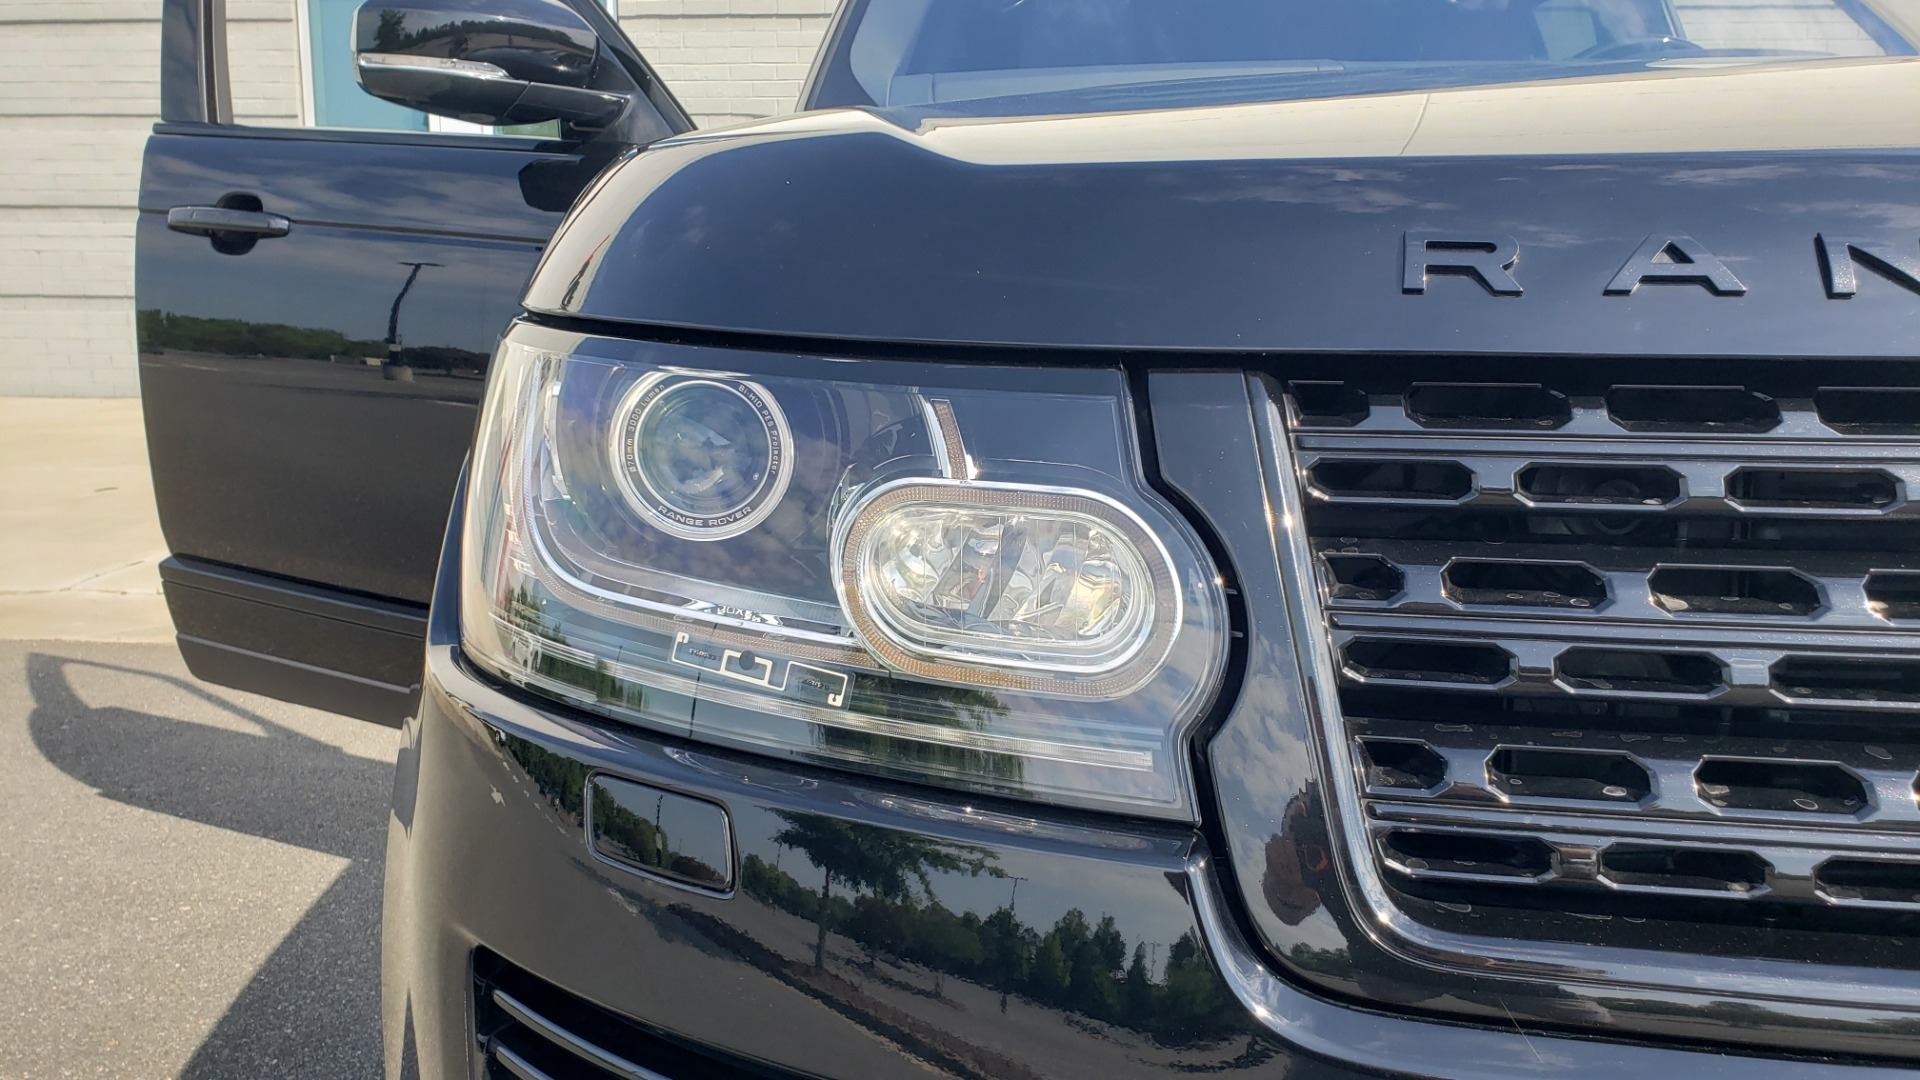 Used 2017 Land Rover RANGE ROVER SC V8 / VISION ASST / DRIVE PKG / MERIDIAN SOUND / PANO-ROOF / NAV / BSM for sale $75,995 at Formula Imports in Charlotte NC 28227 26